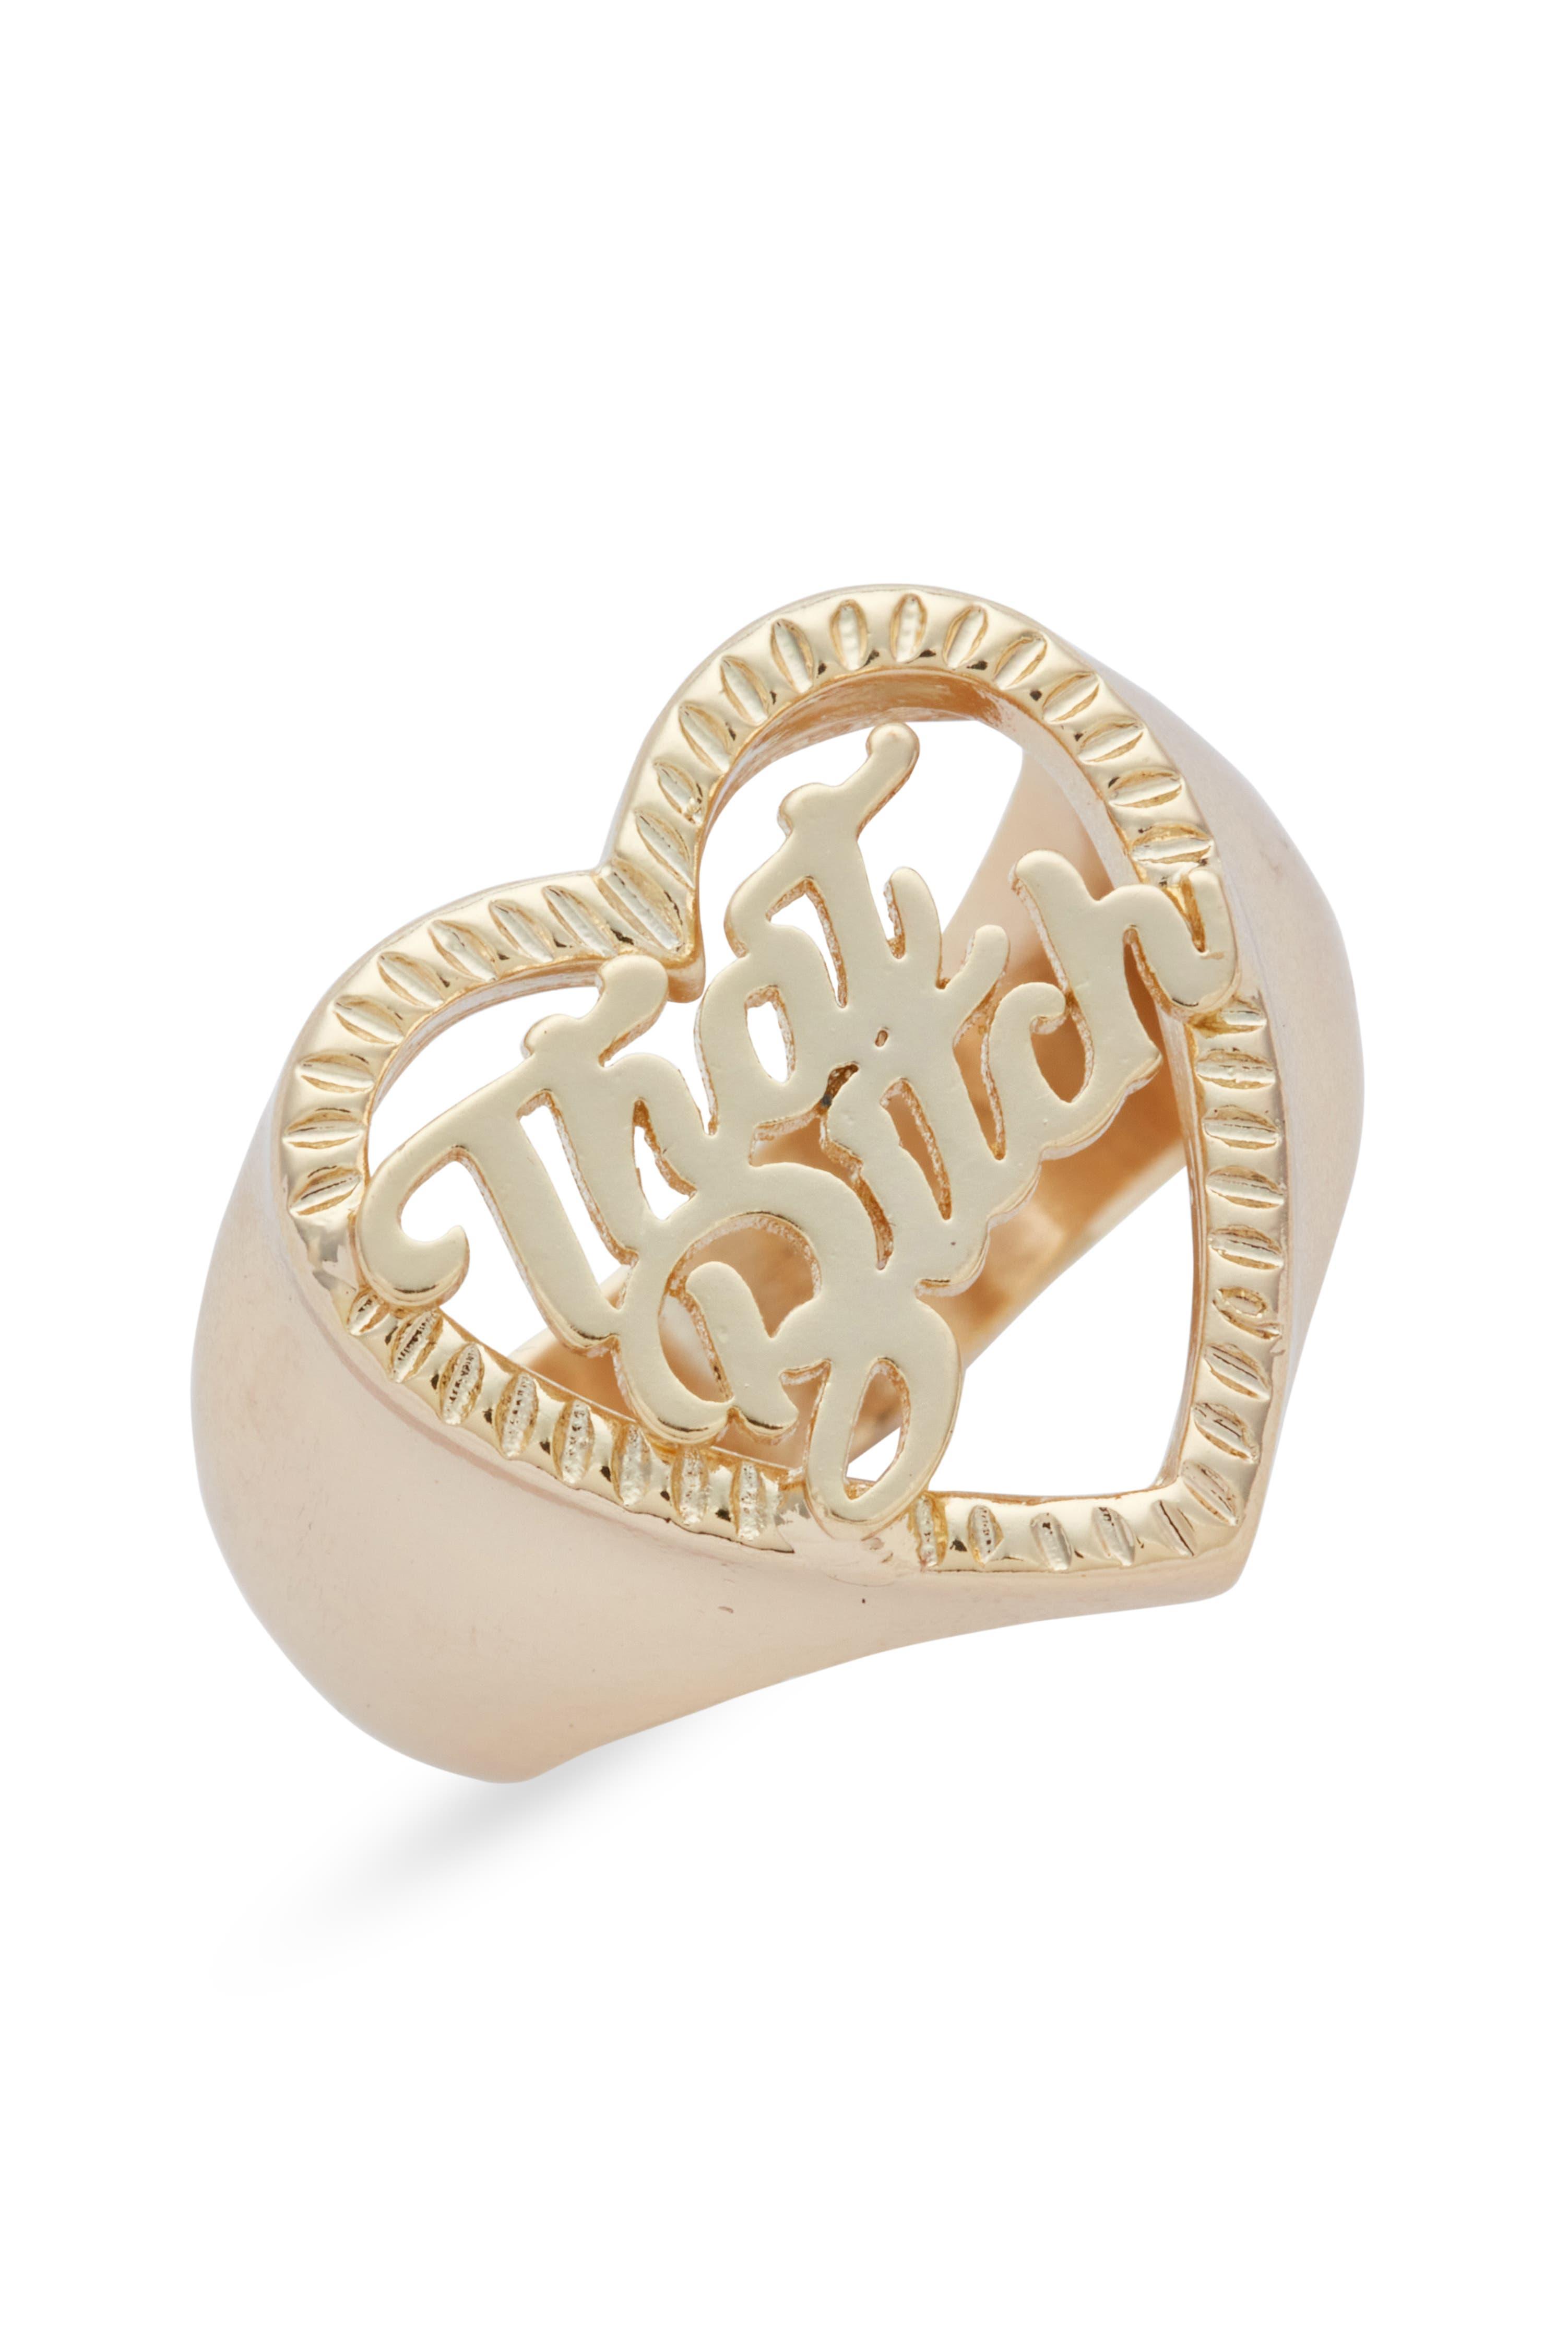 That Bitch Ring